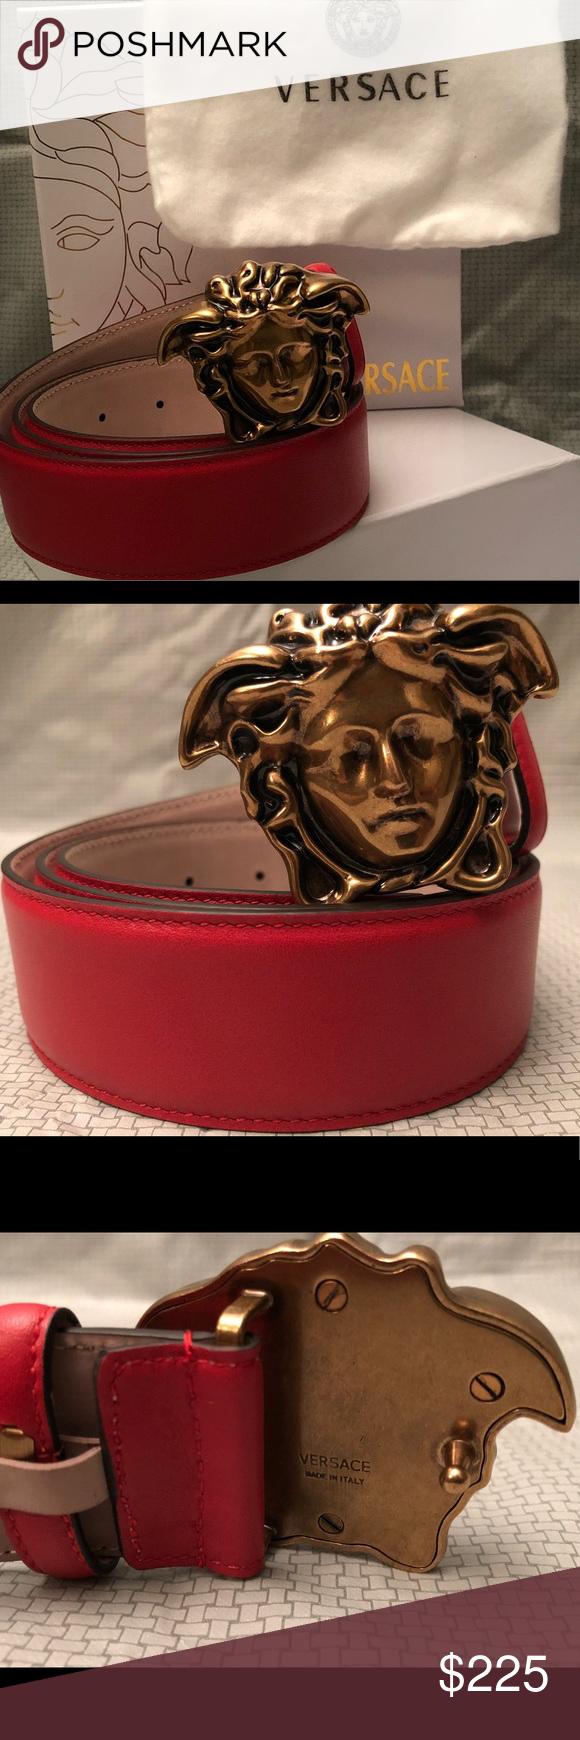 60878418d9cf Red Palazzo Versace Belt 100% Leather Belt Iconic Gold Medusa Buckle Men s  size 30-32 Versace Accessories Belts